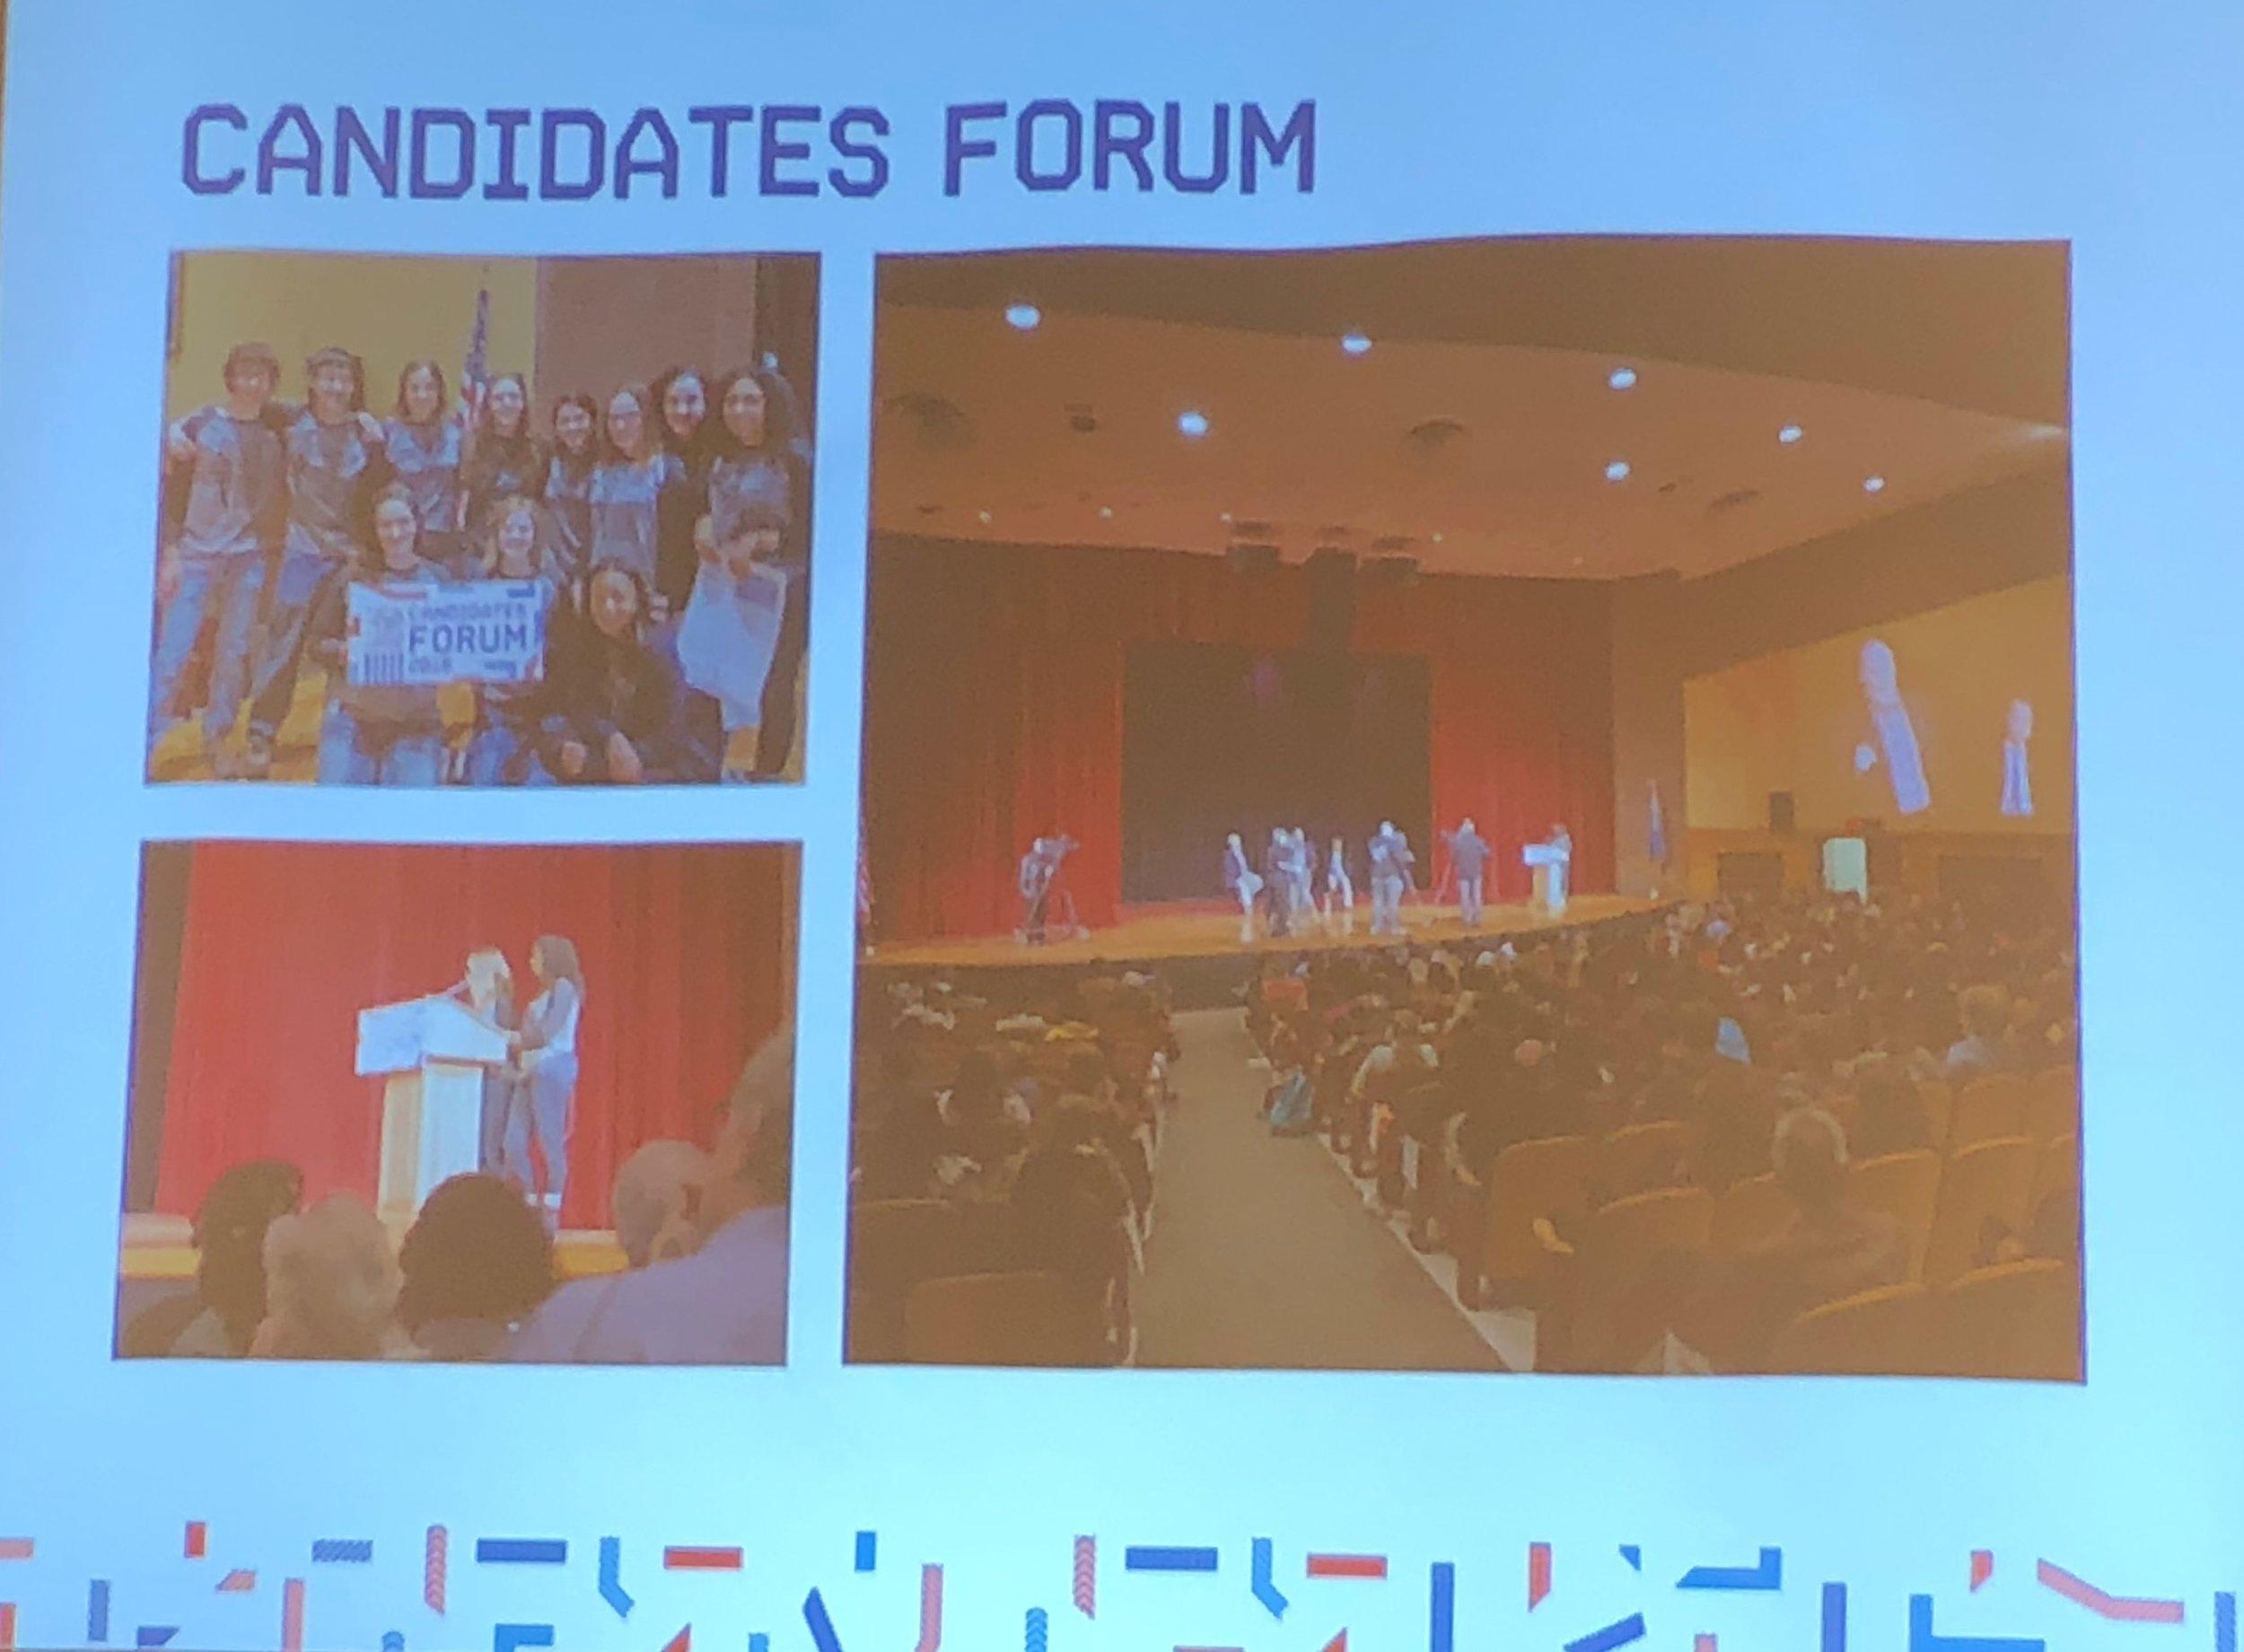 AYV Slide 13 Candidate Forum.jpg